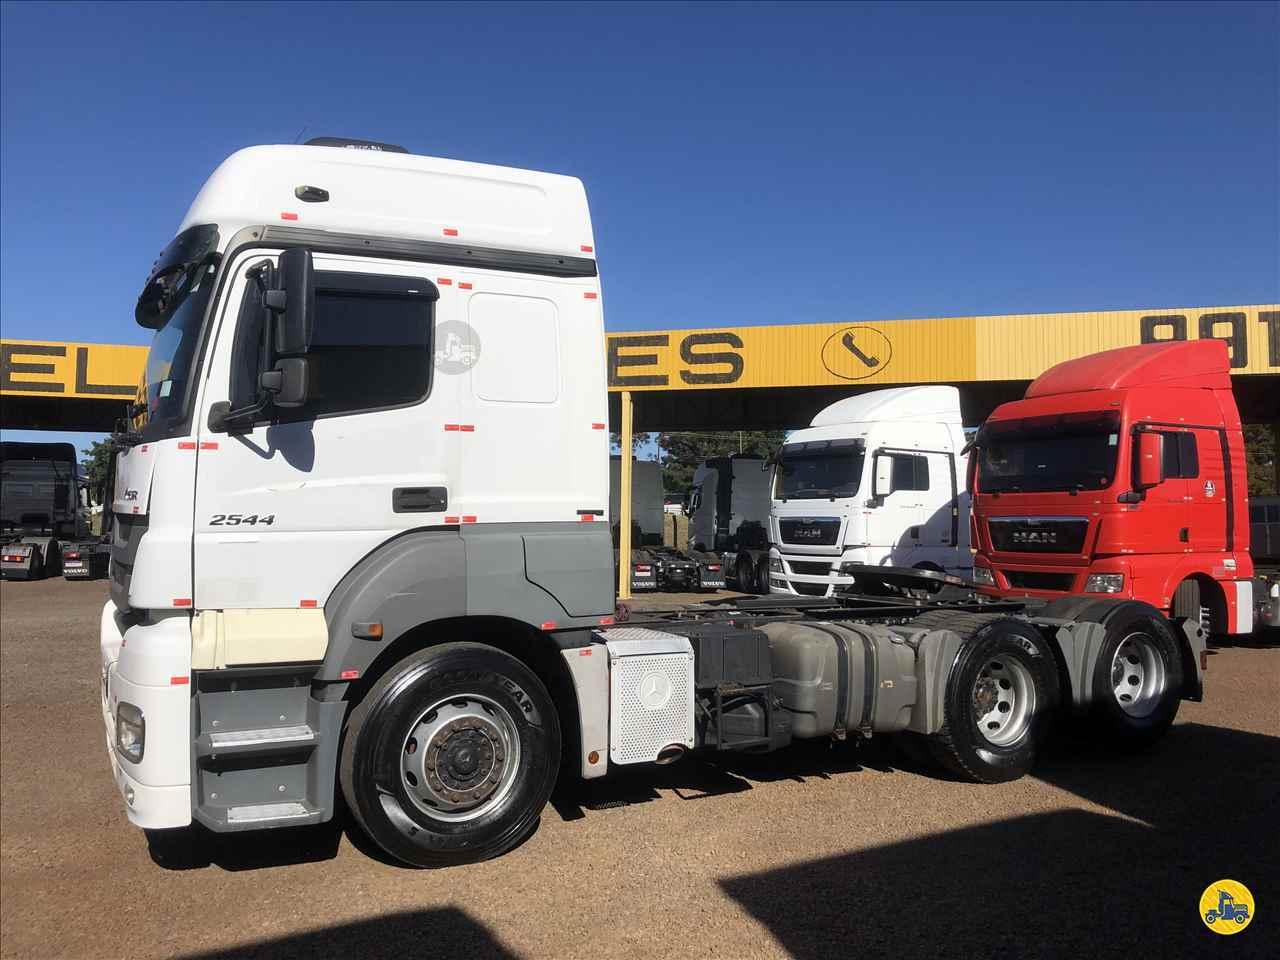 CAMINHAO MERCEDES-BENZ MB 2544 Cavalo Mecânico Truck 6x2 Mercediesel Caminhões ARAPONGAS PARANÁ PR